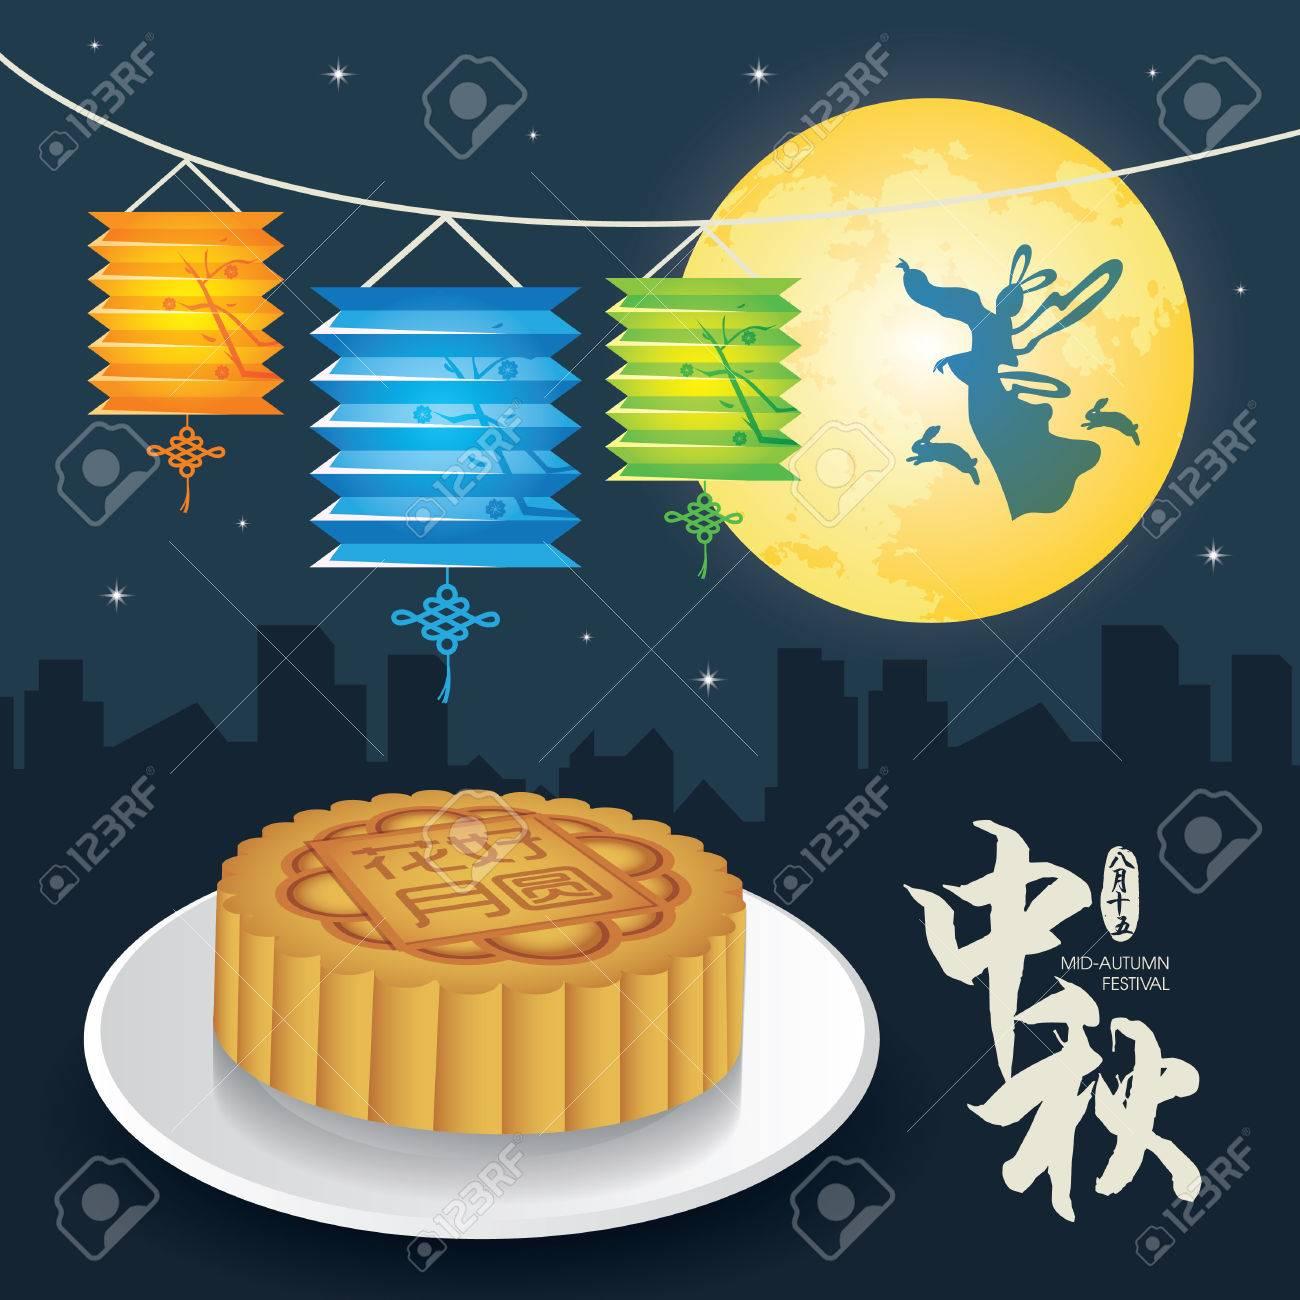 Mid-autumn festival illustration of Chang'e (moon goddess), bunny, moon cakes, lantern. Caption: Mid-autumn festival, 15th august - 82108673